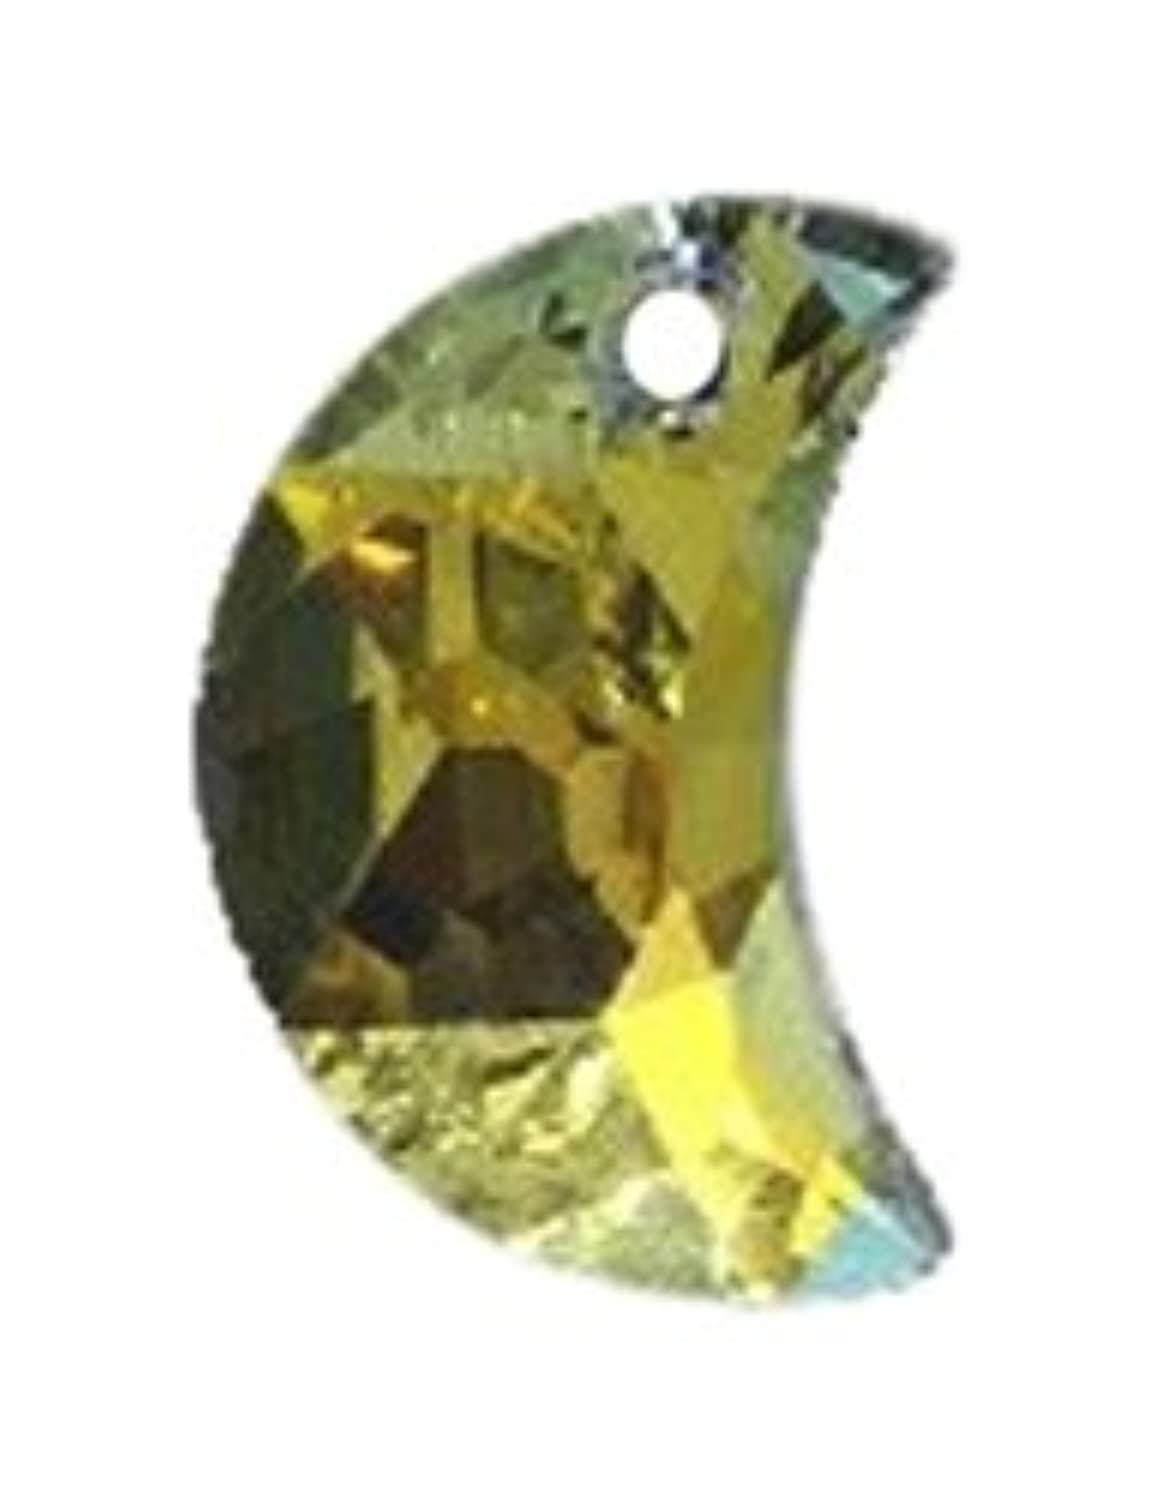 Swarovski 6722 Moon Shapes Beads, Aurora Borealis, Crystal, 16mm, 2 Per Pack